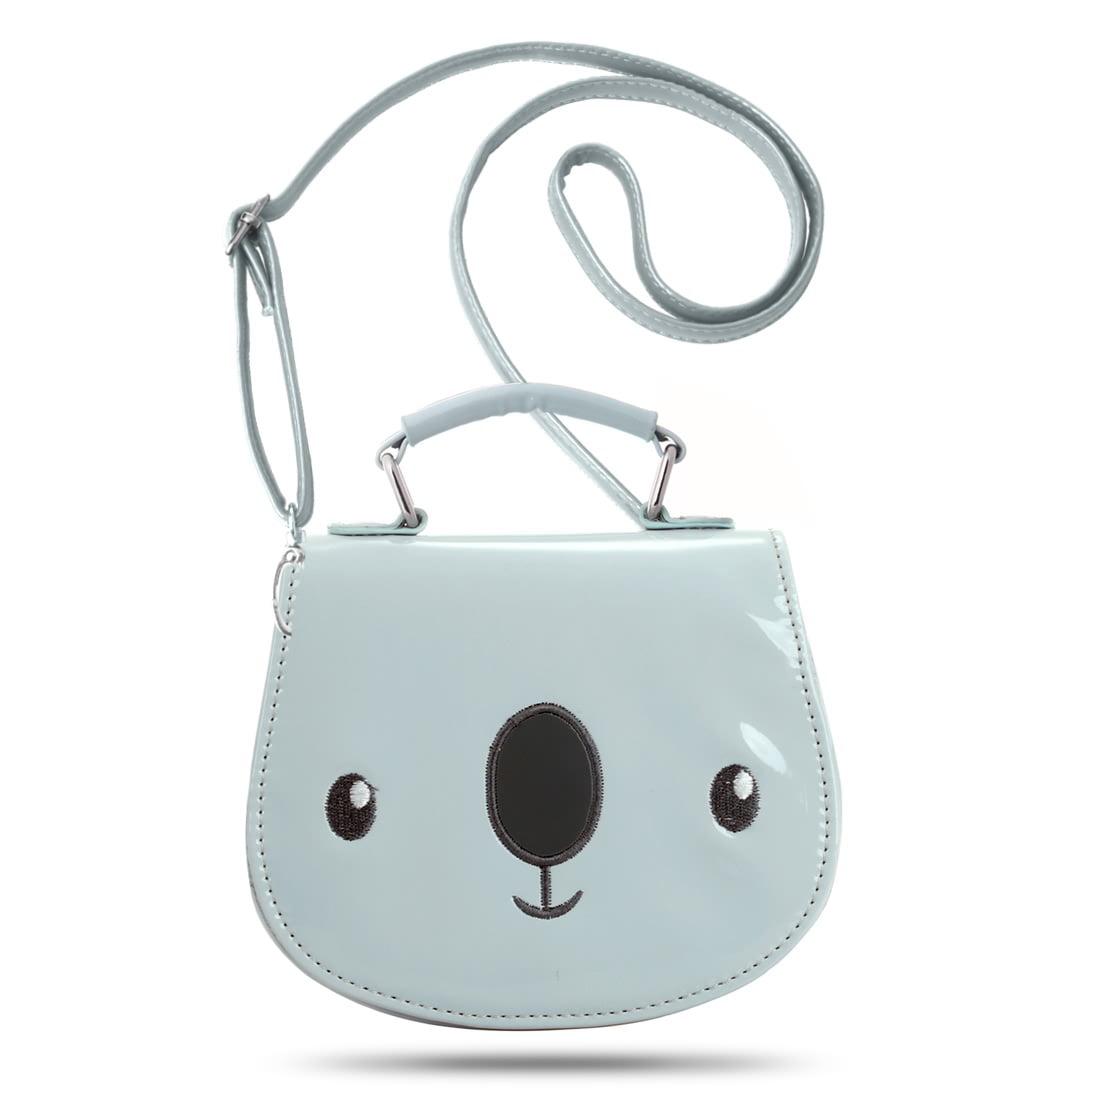 Clutch Crossbody Bag Pretty Cute Clever Animal Pet Cat Adjustable Shoulder Strap Shoulder Bag For Girls For Women Girls Ladies Handbags Tote Handbags Shoulder Bags